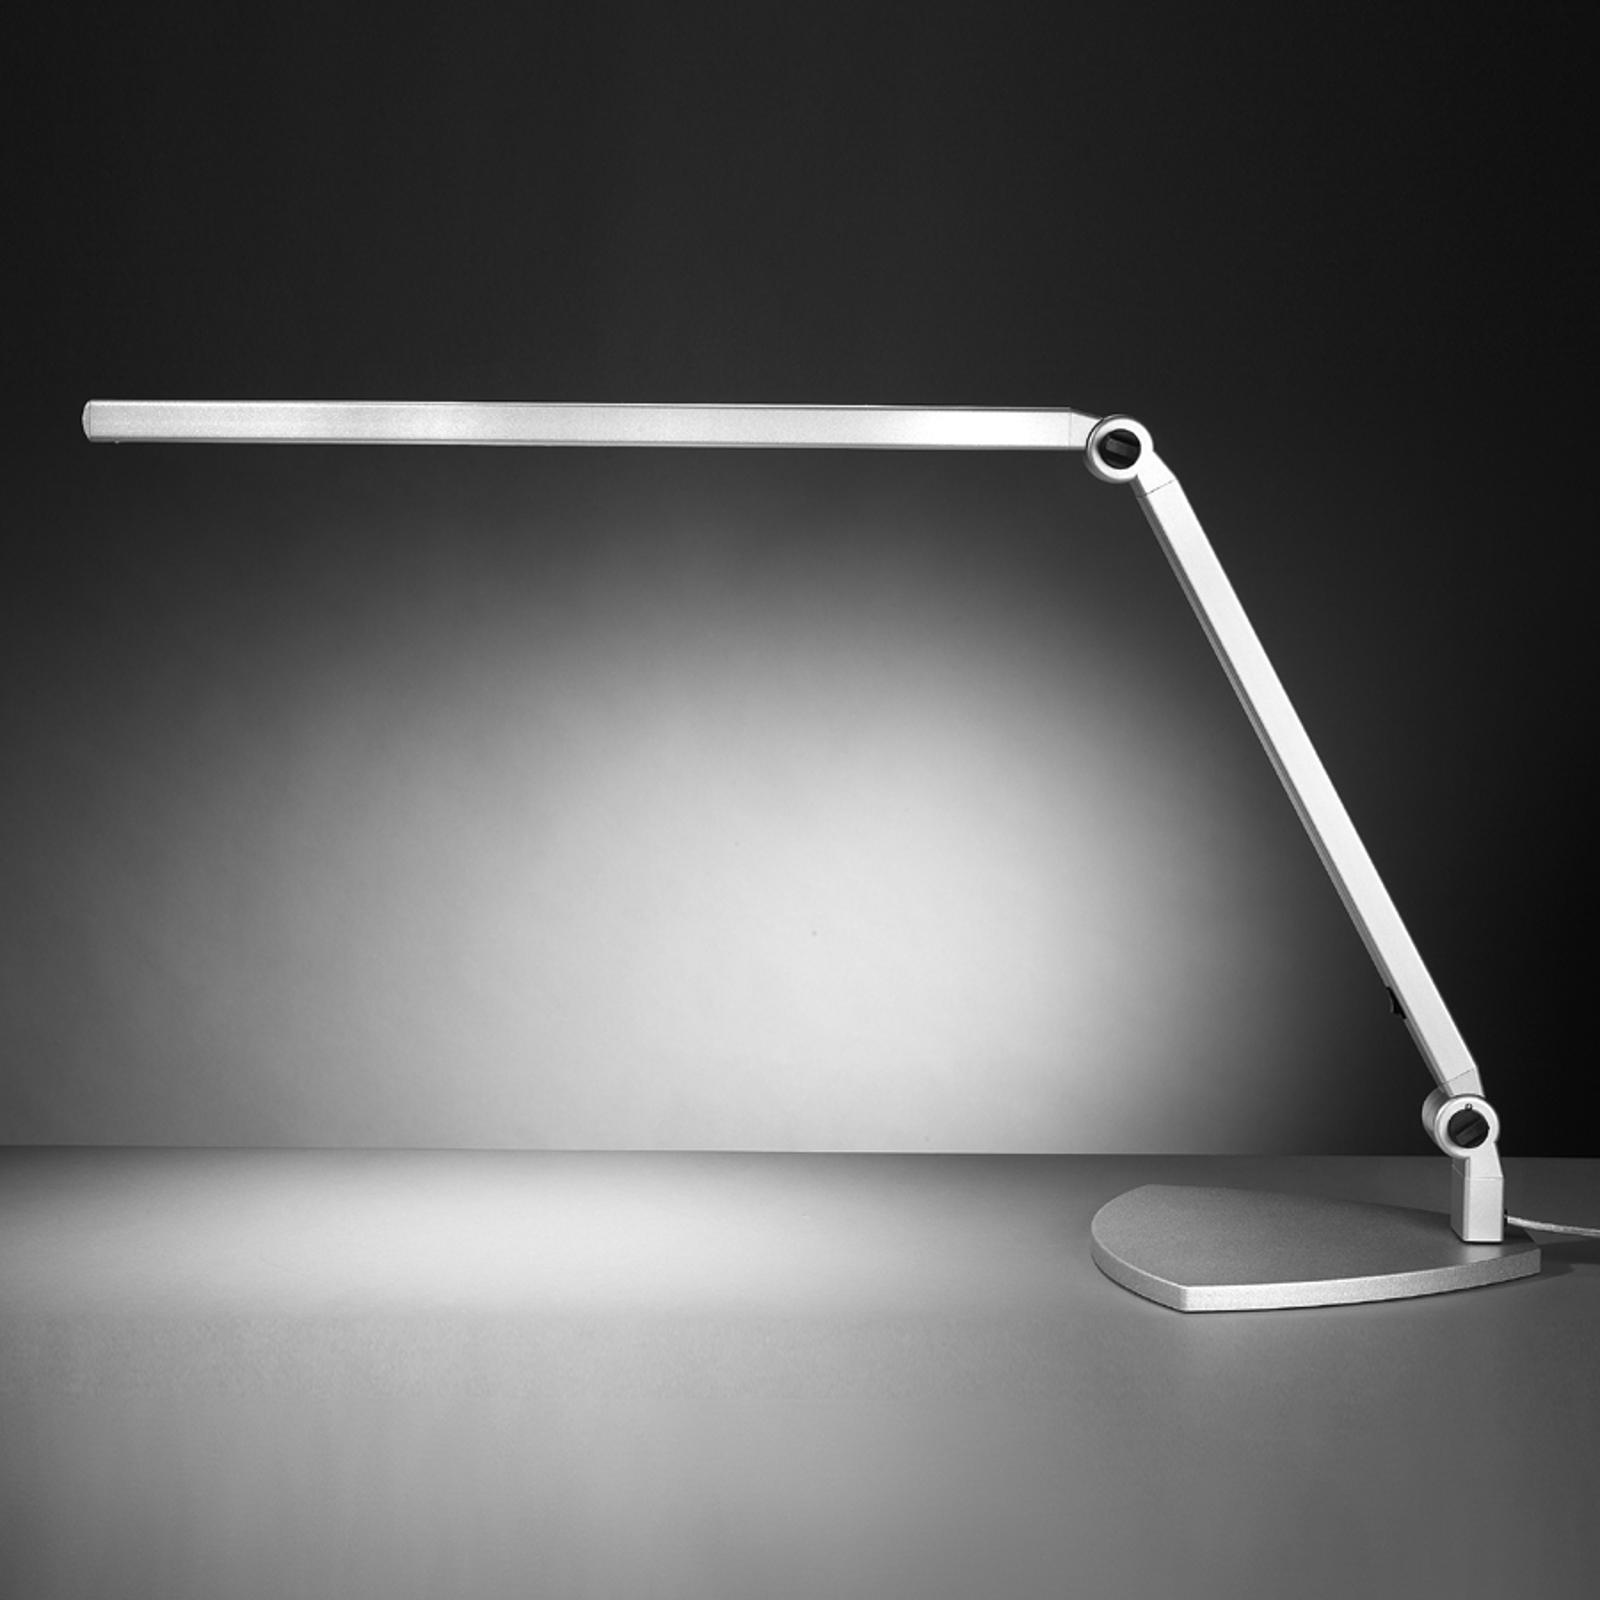 LED-pöytävalo Take 5, jalallinen, päivänvalo